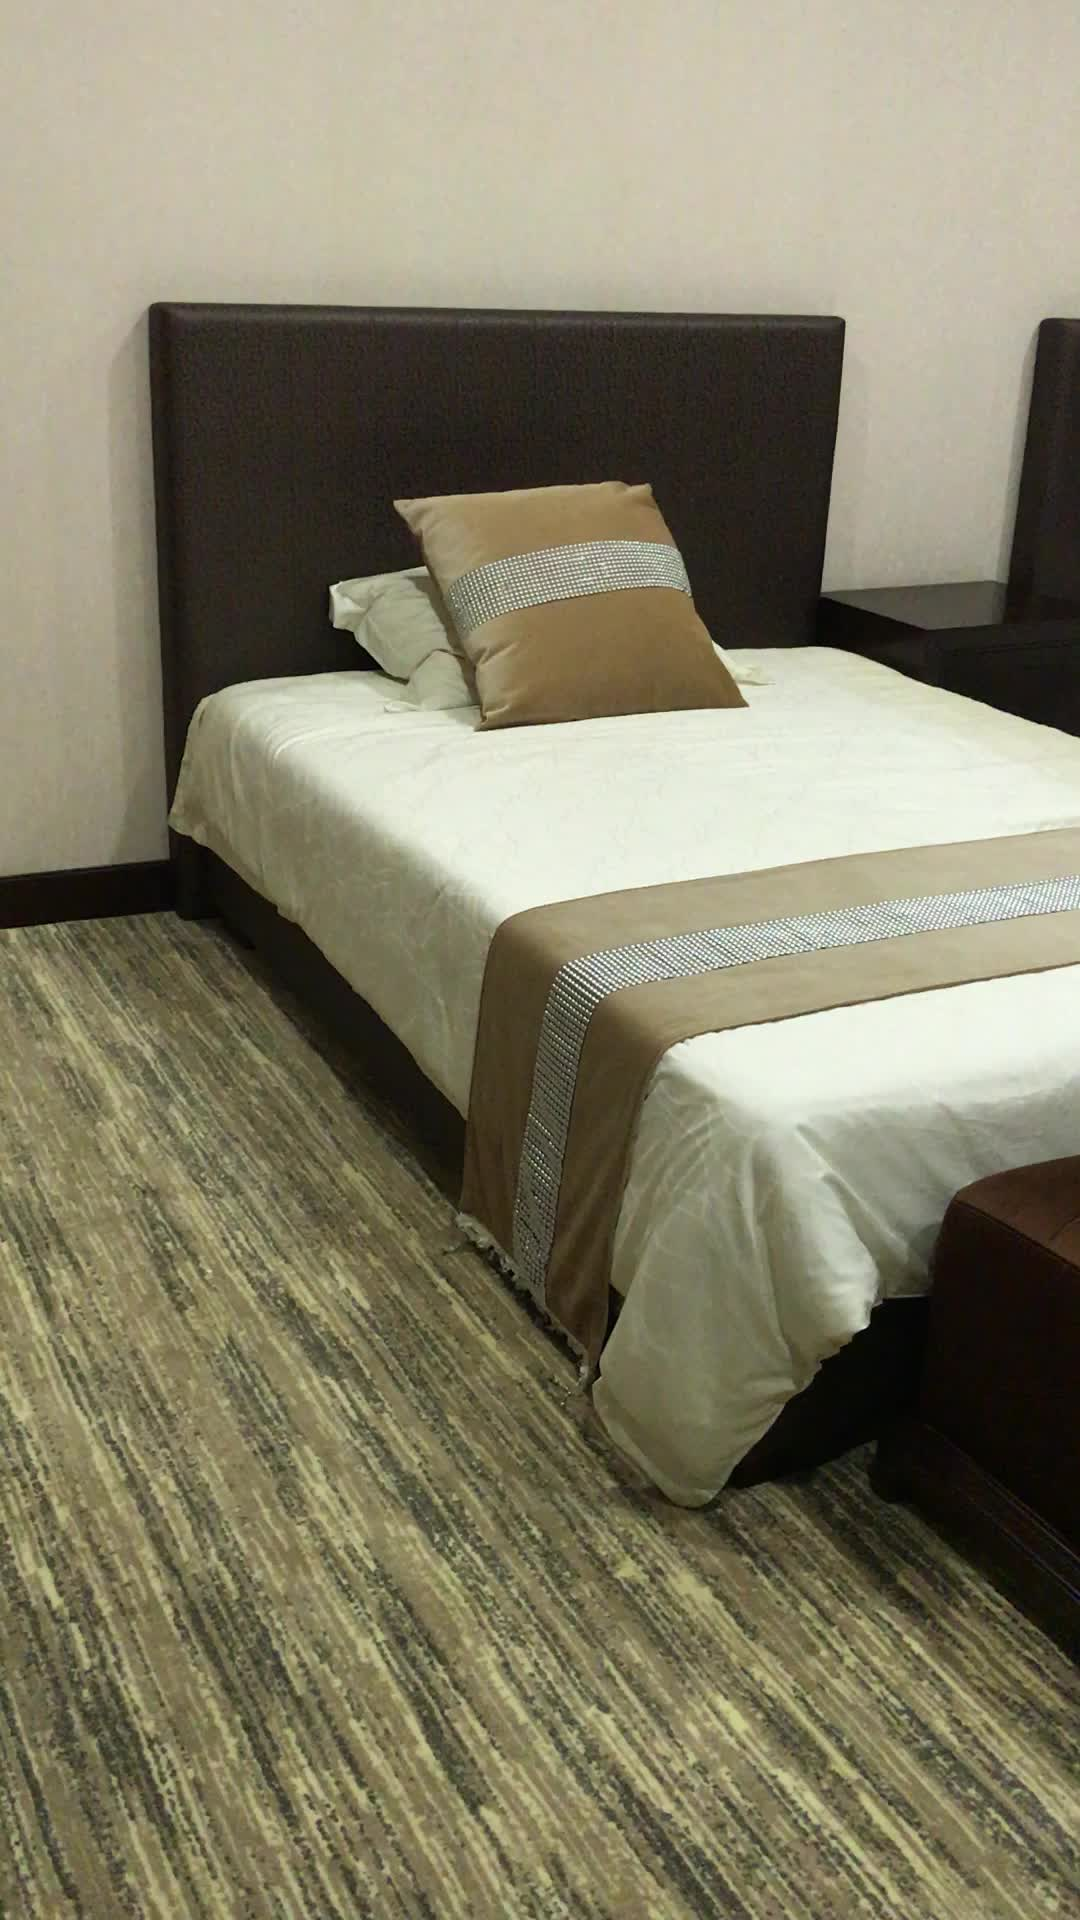 simple design ornate solid ash wood bedroom furniture for the hotel bedroom buy furniture for. Black Bedroom Furniture Sets. Home Design Ideas